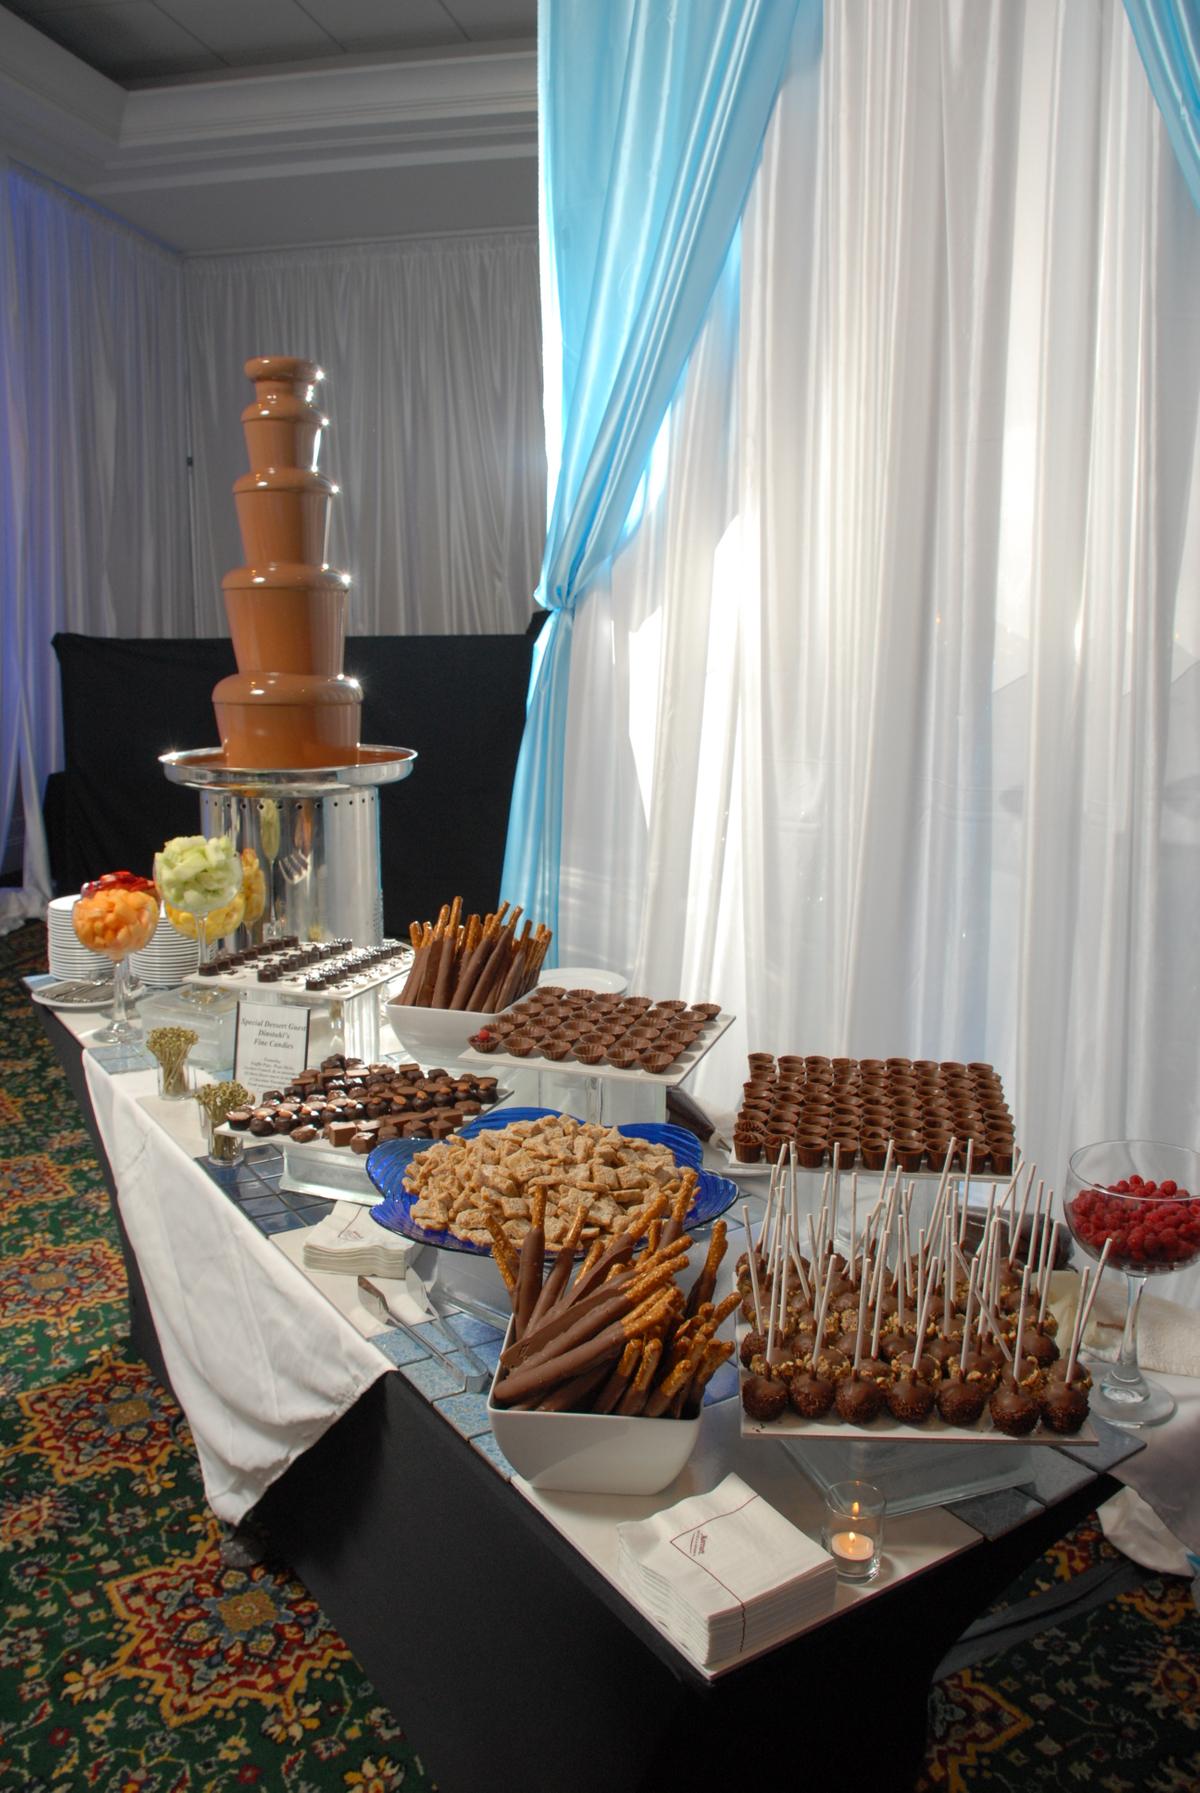 Copy of Dinstuhl's Chocolate Events.jpg